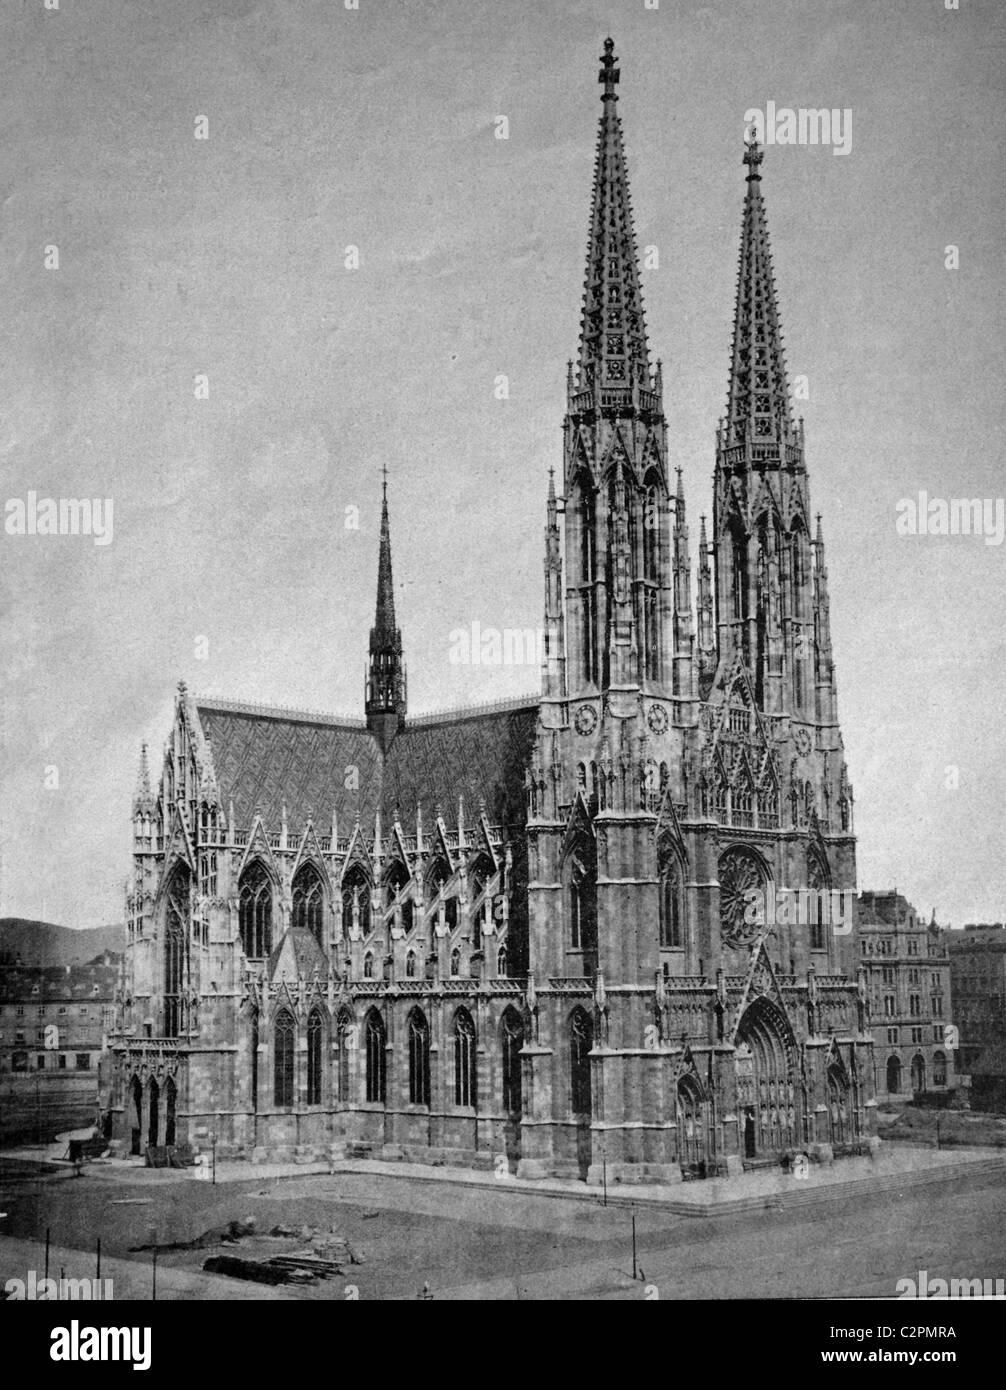 Early autotype the Votive Church, Vienna, Austria, historical photographs, 1884 Stock Photo